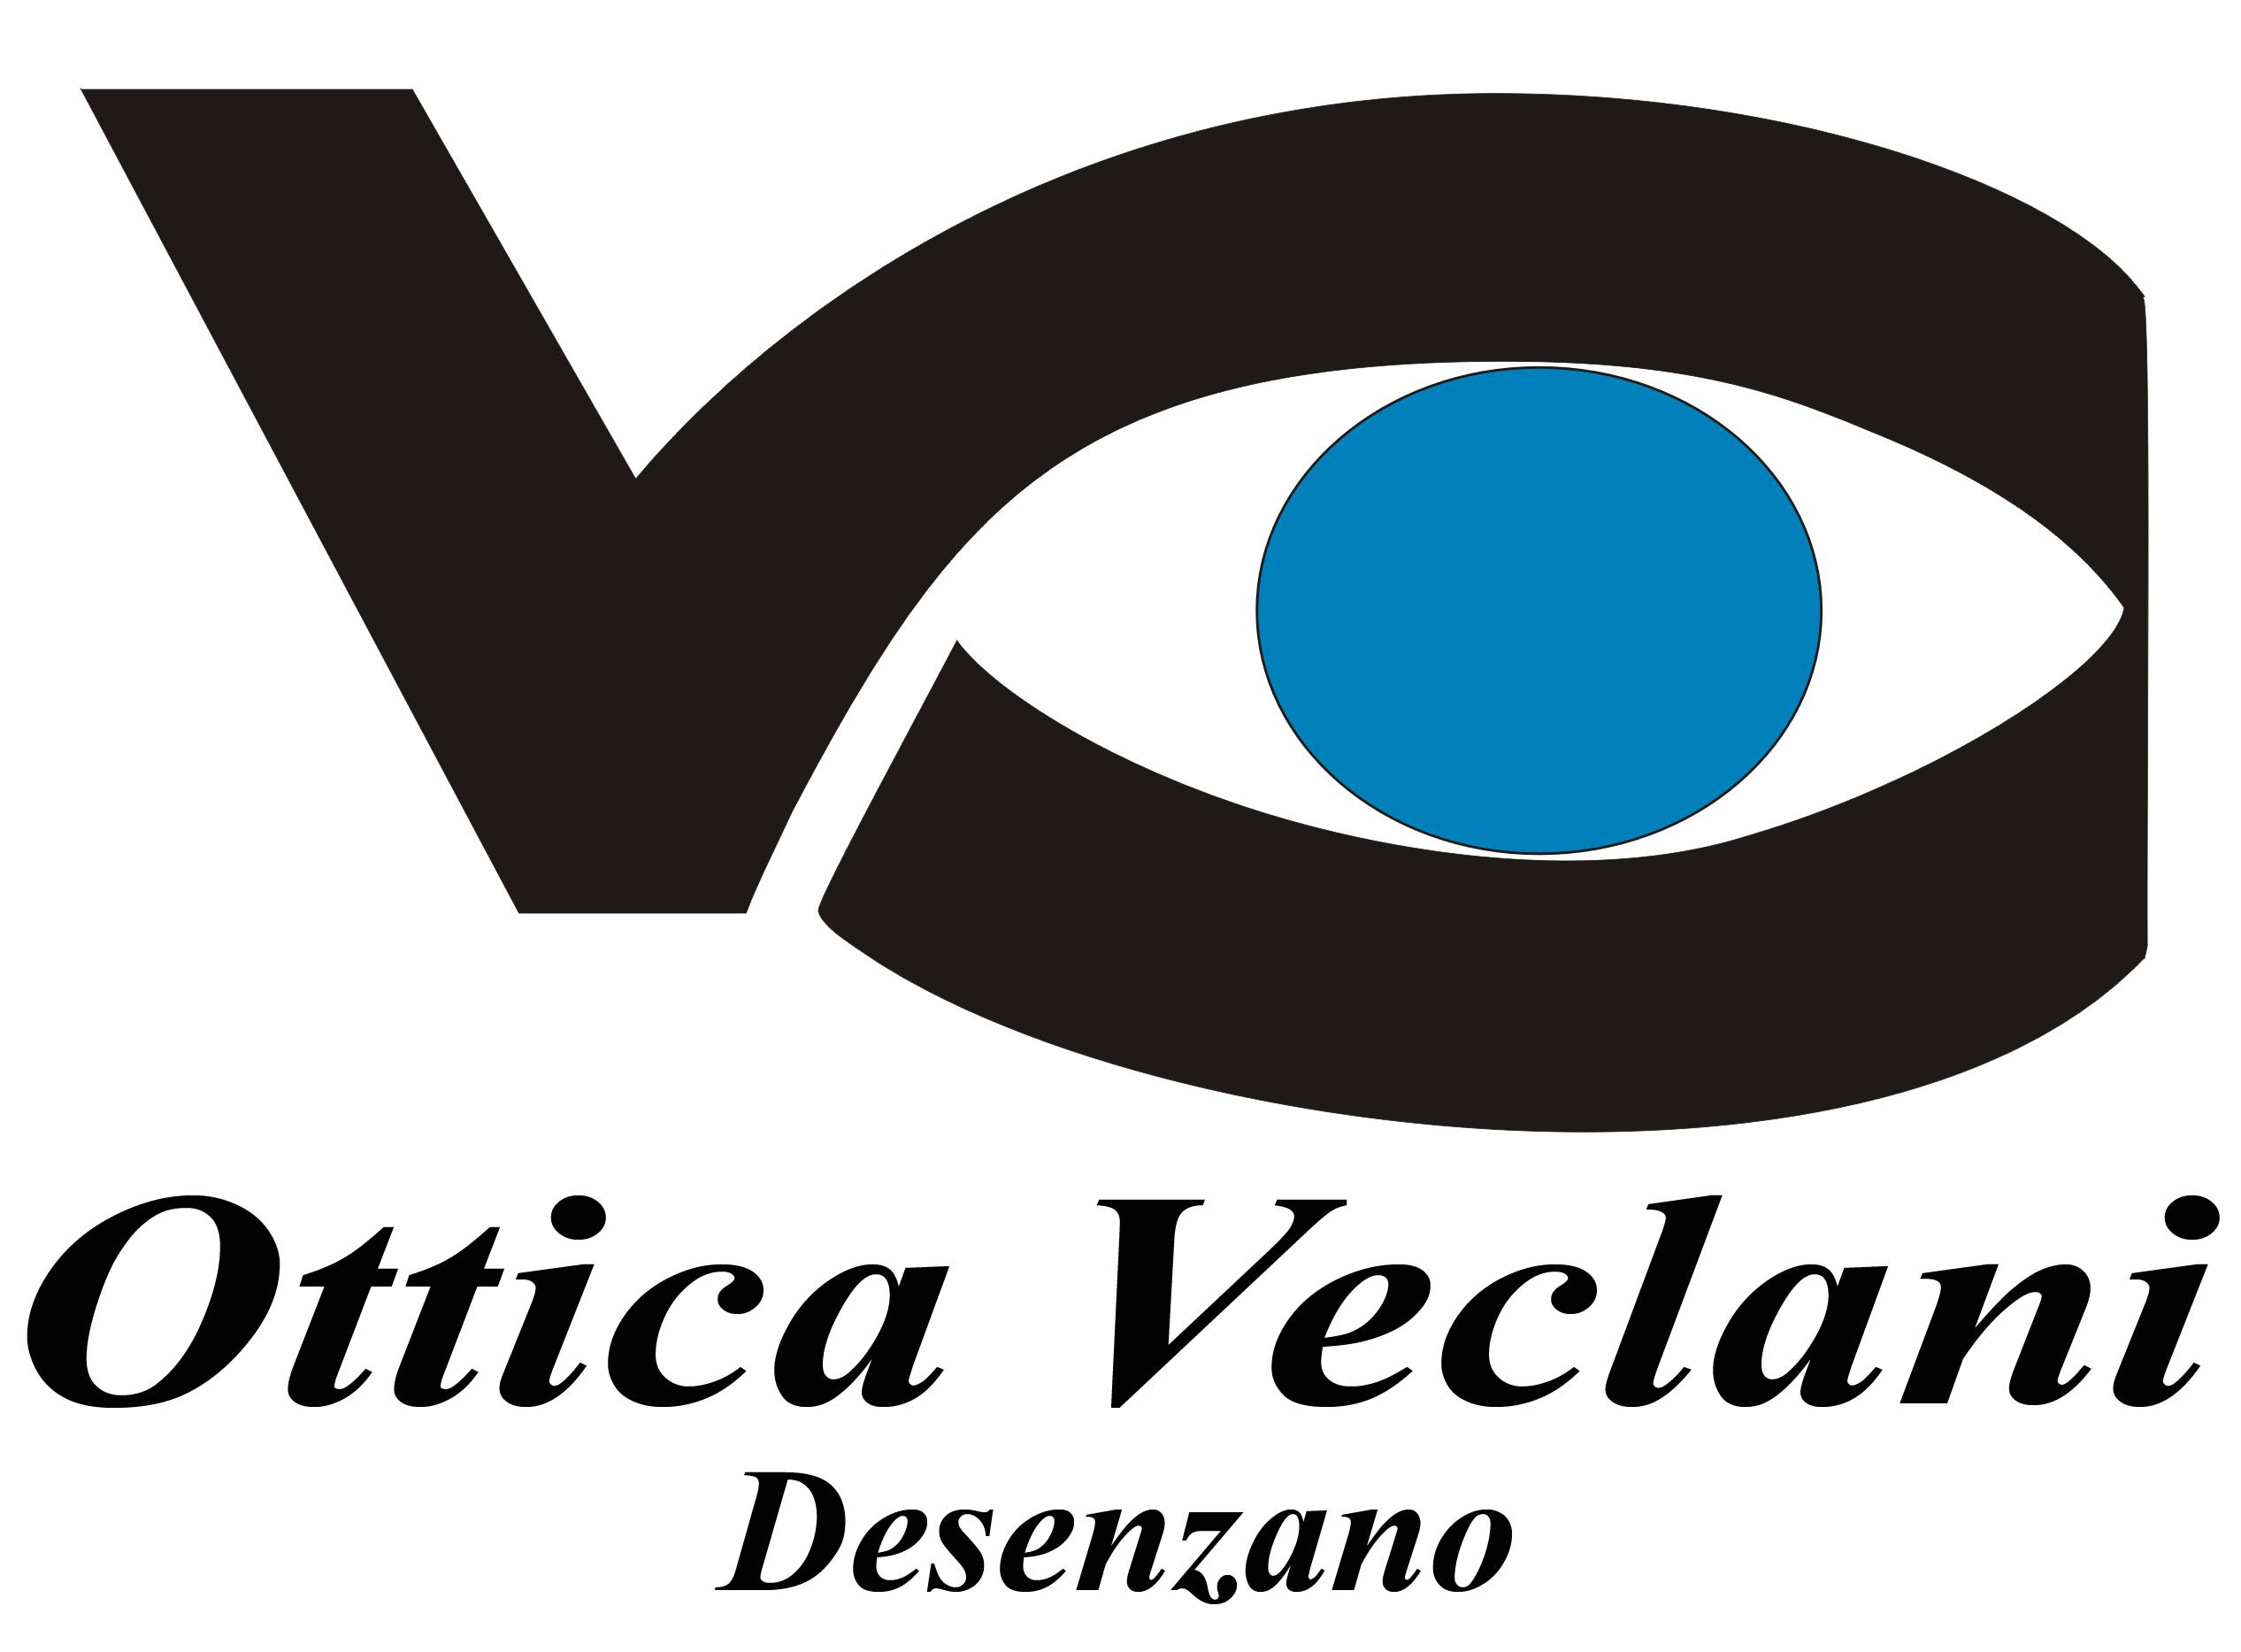 Logo-Veclani-Desenzano-2